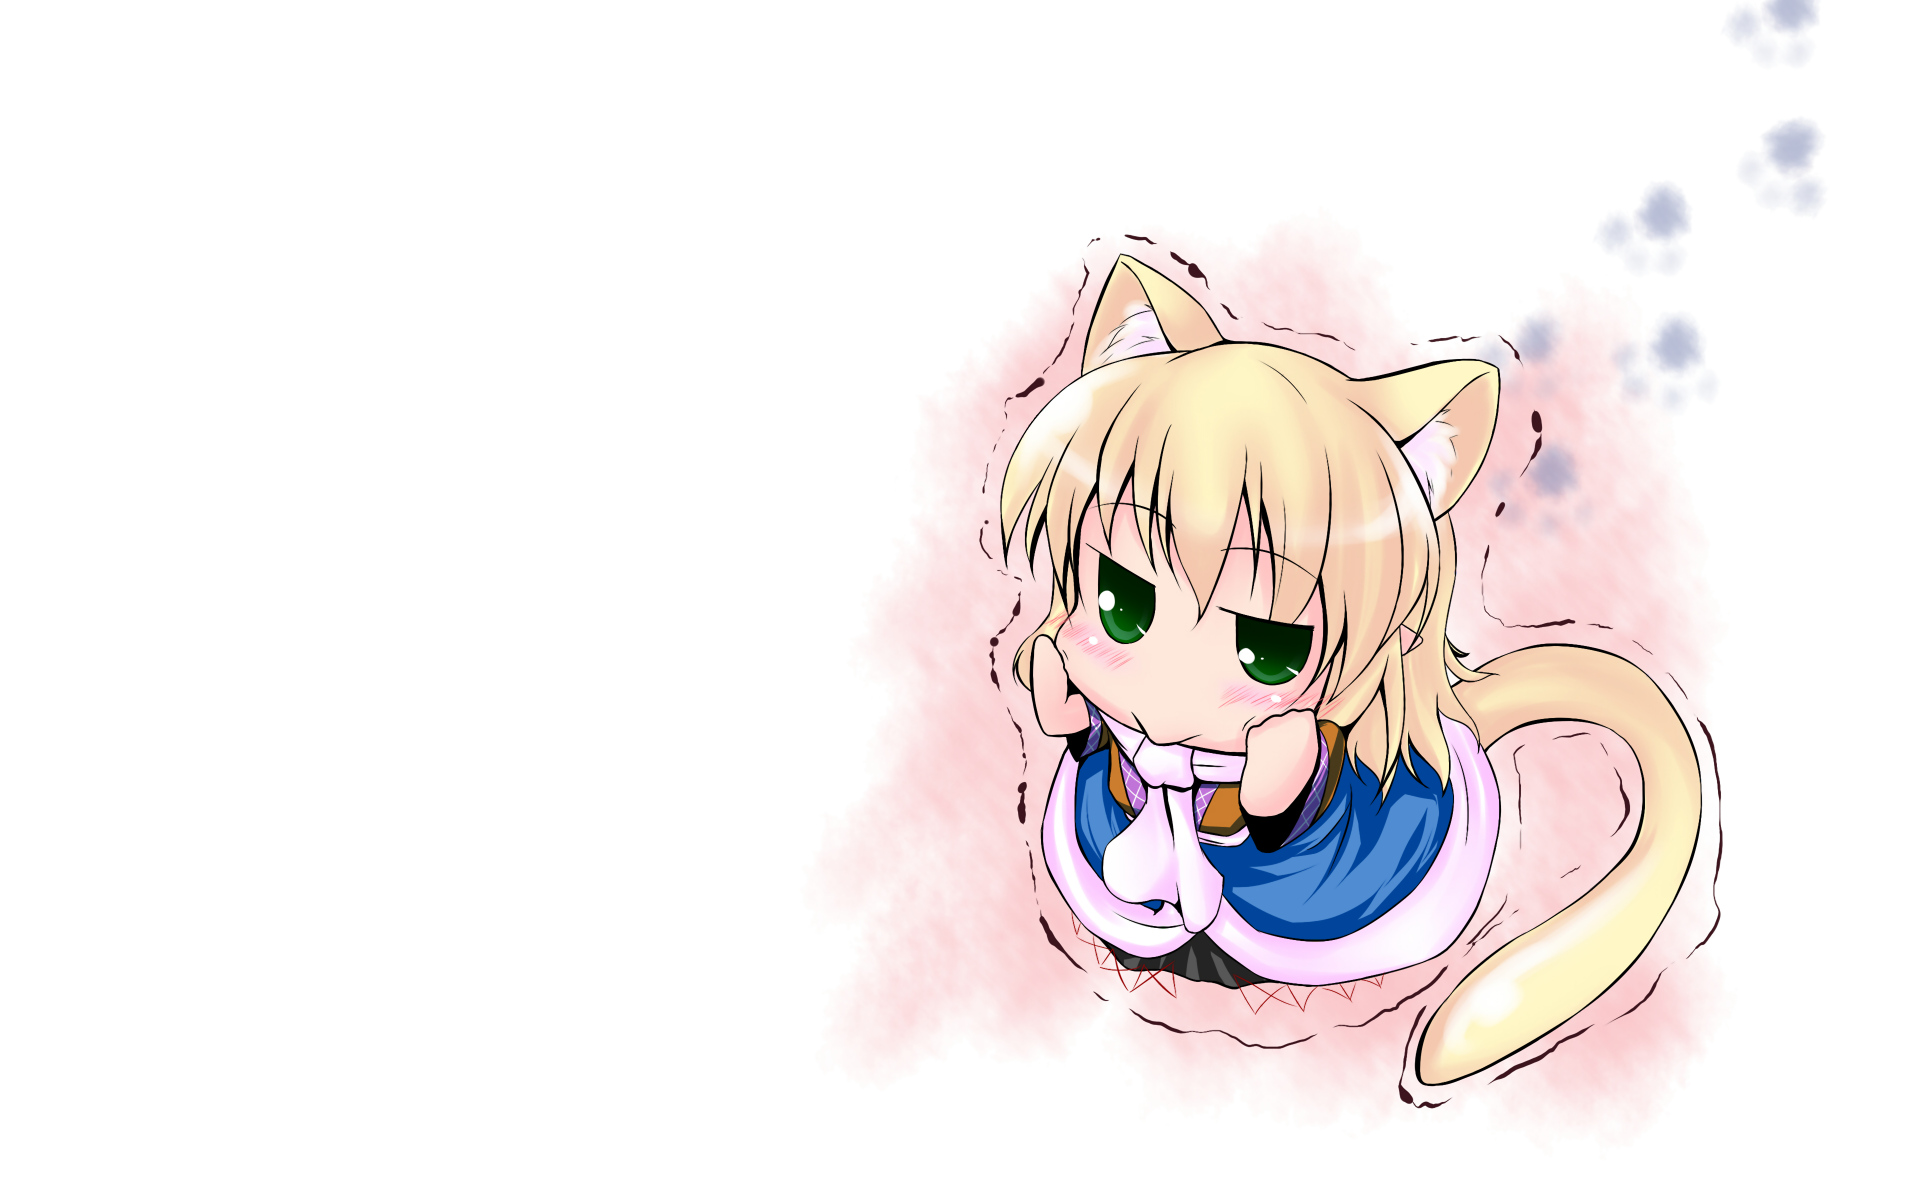 animal_ears blush chibi hoshizuki_(seigetsu) mizuhashi_parsee pointed_ears tail touhou white